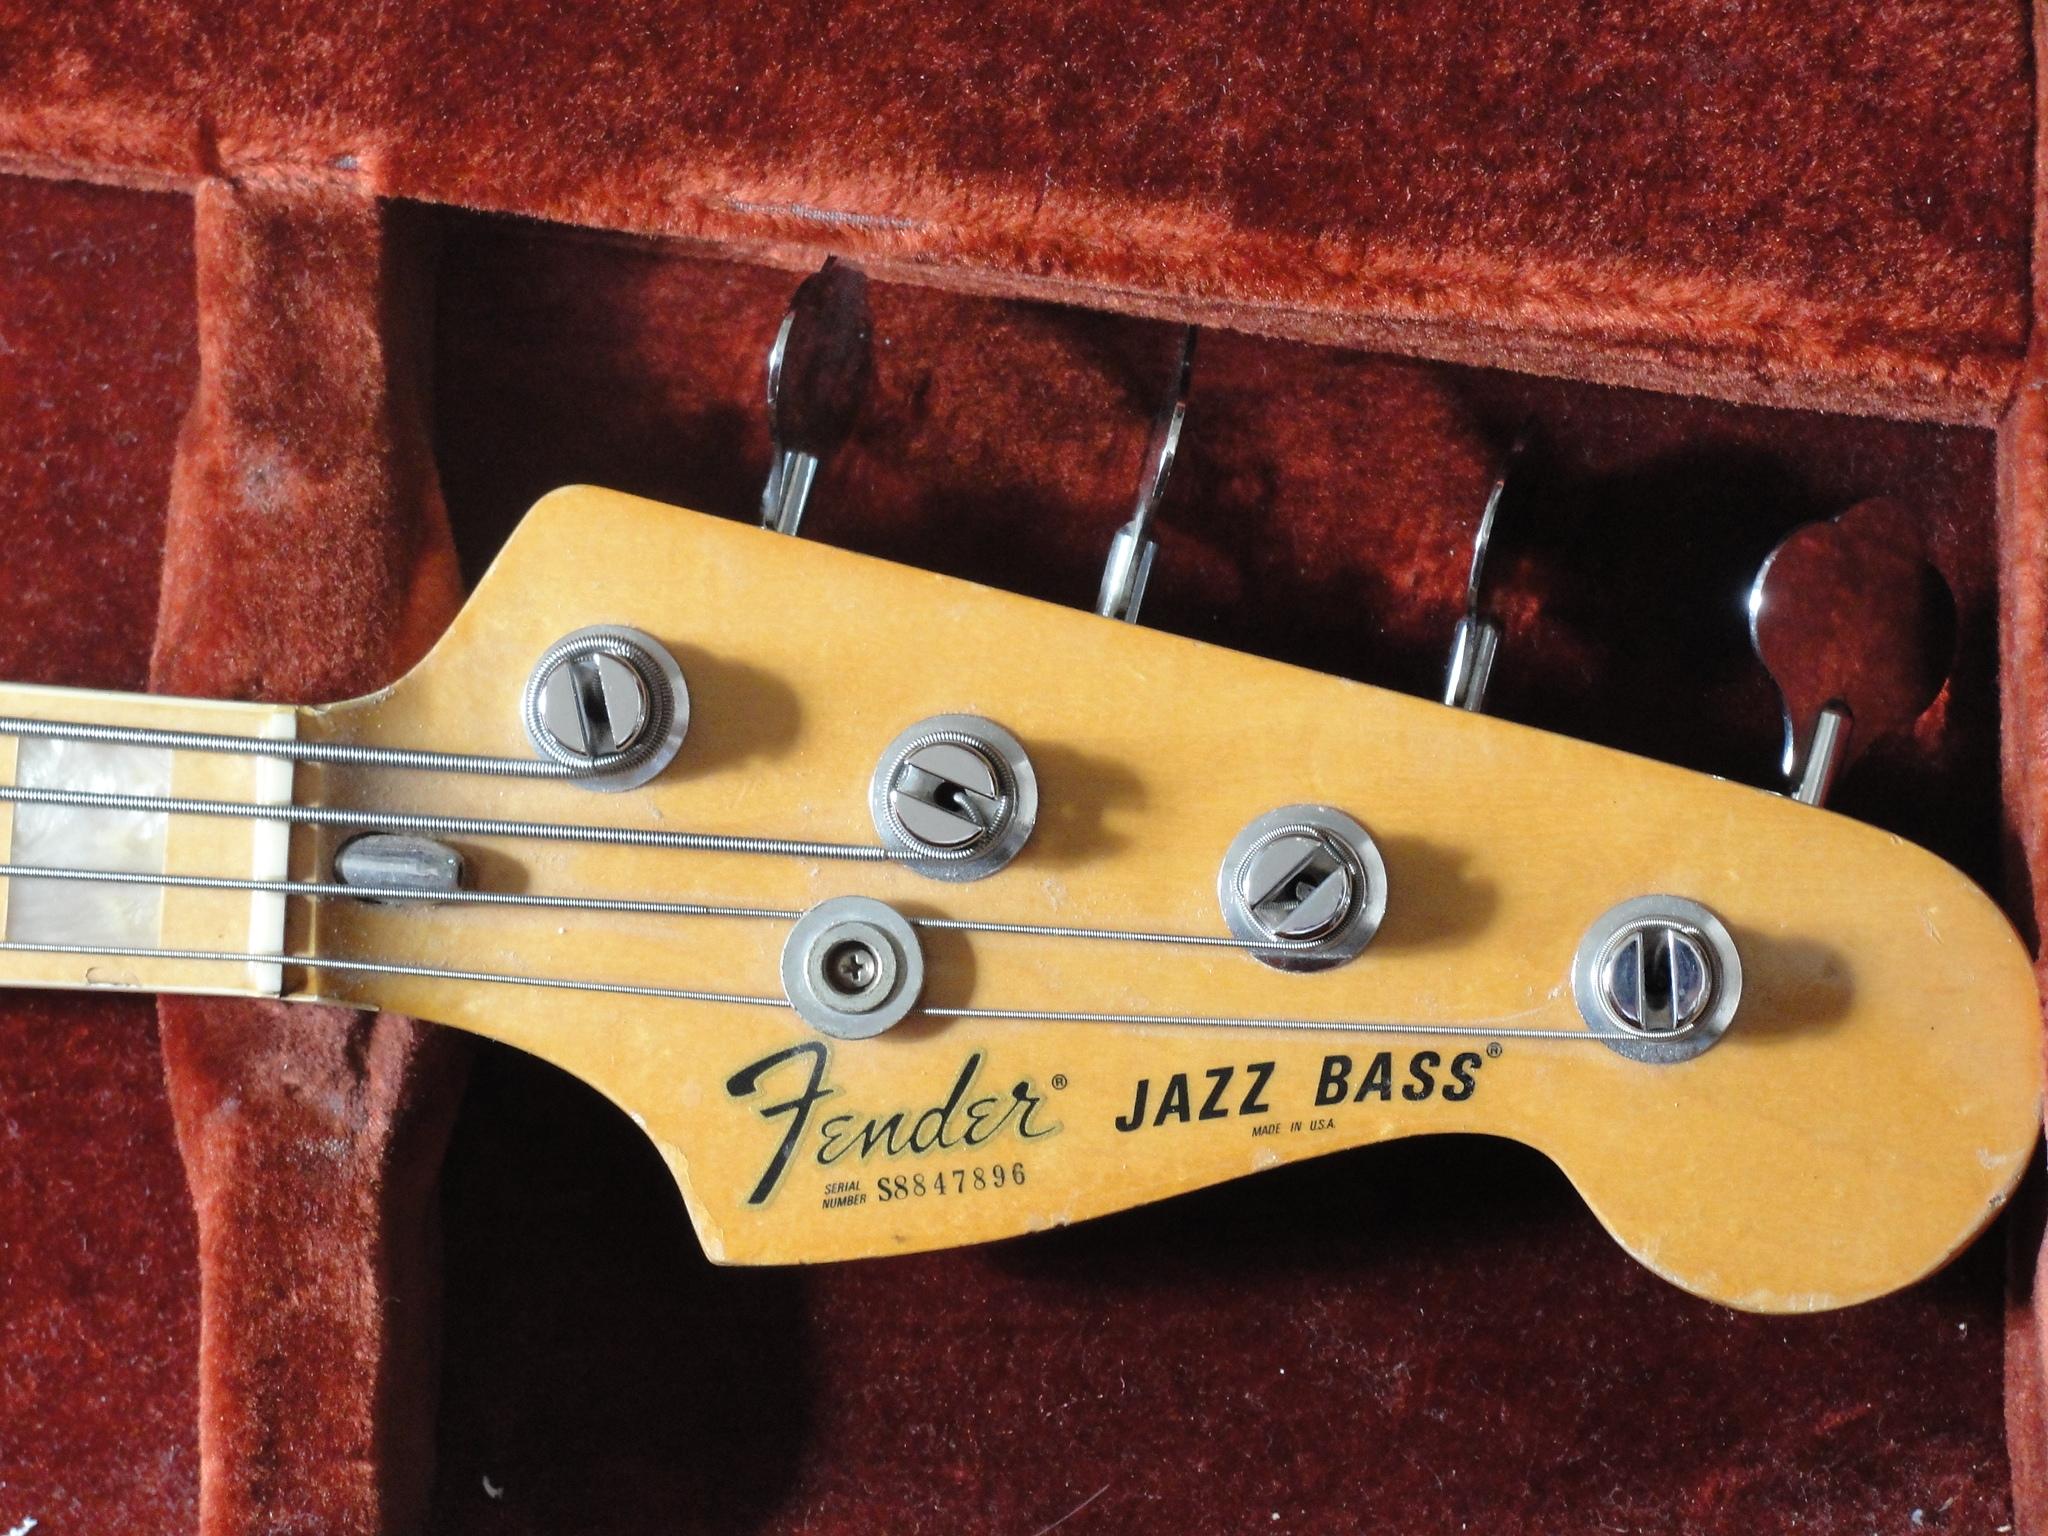 Fender Jazz Bass Wallpaper Vintage fender jazz bass 1978 2048x1536